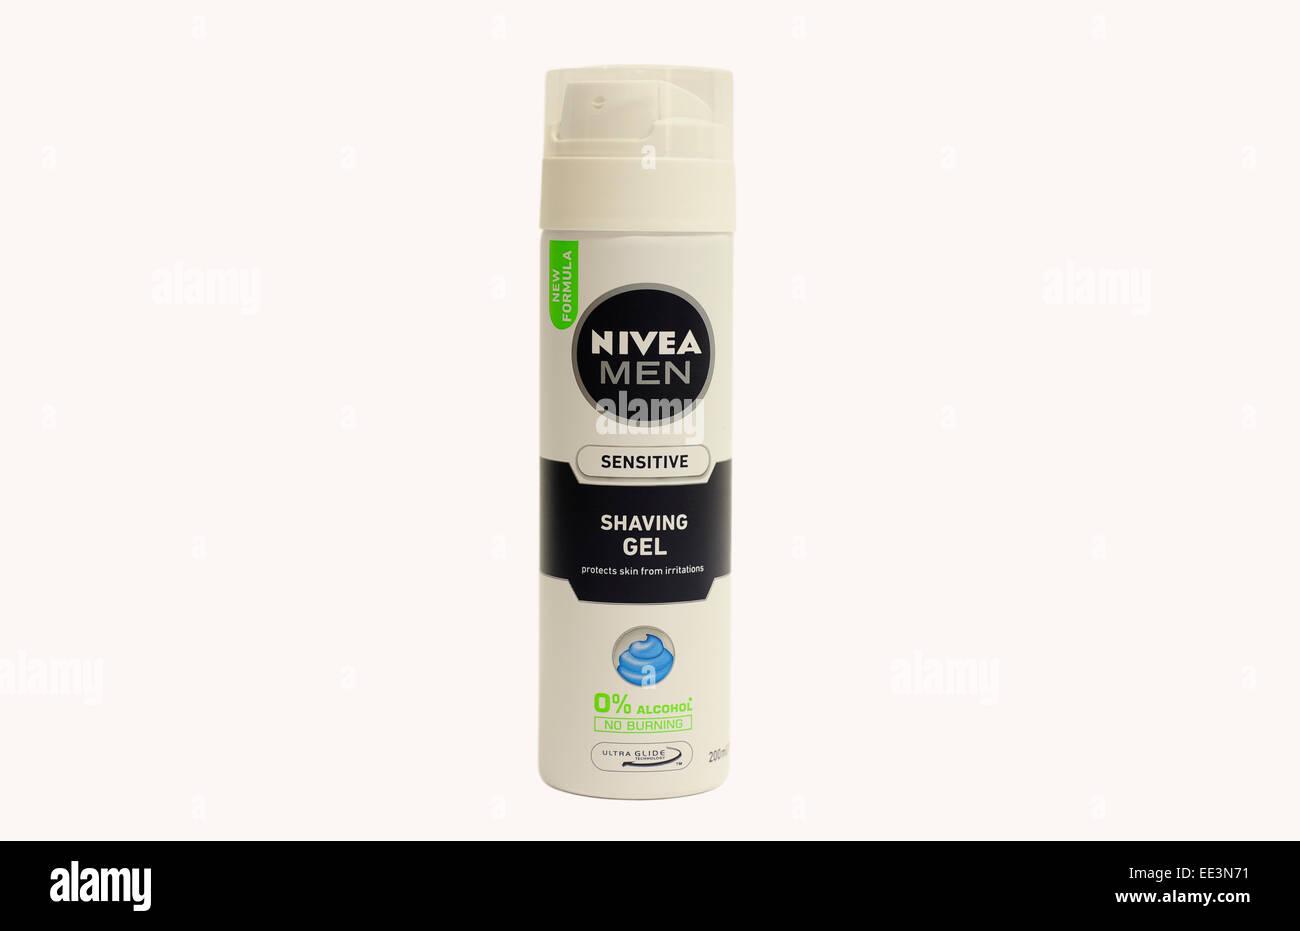 close up of nivea Men Shaving gel - Stock Image